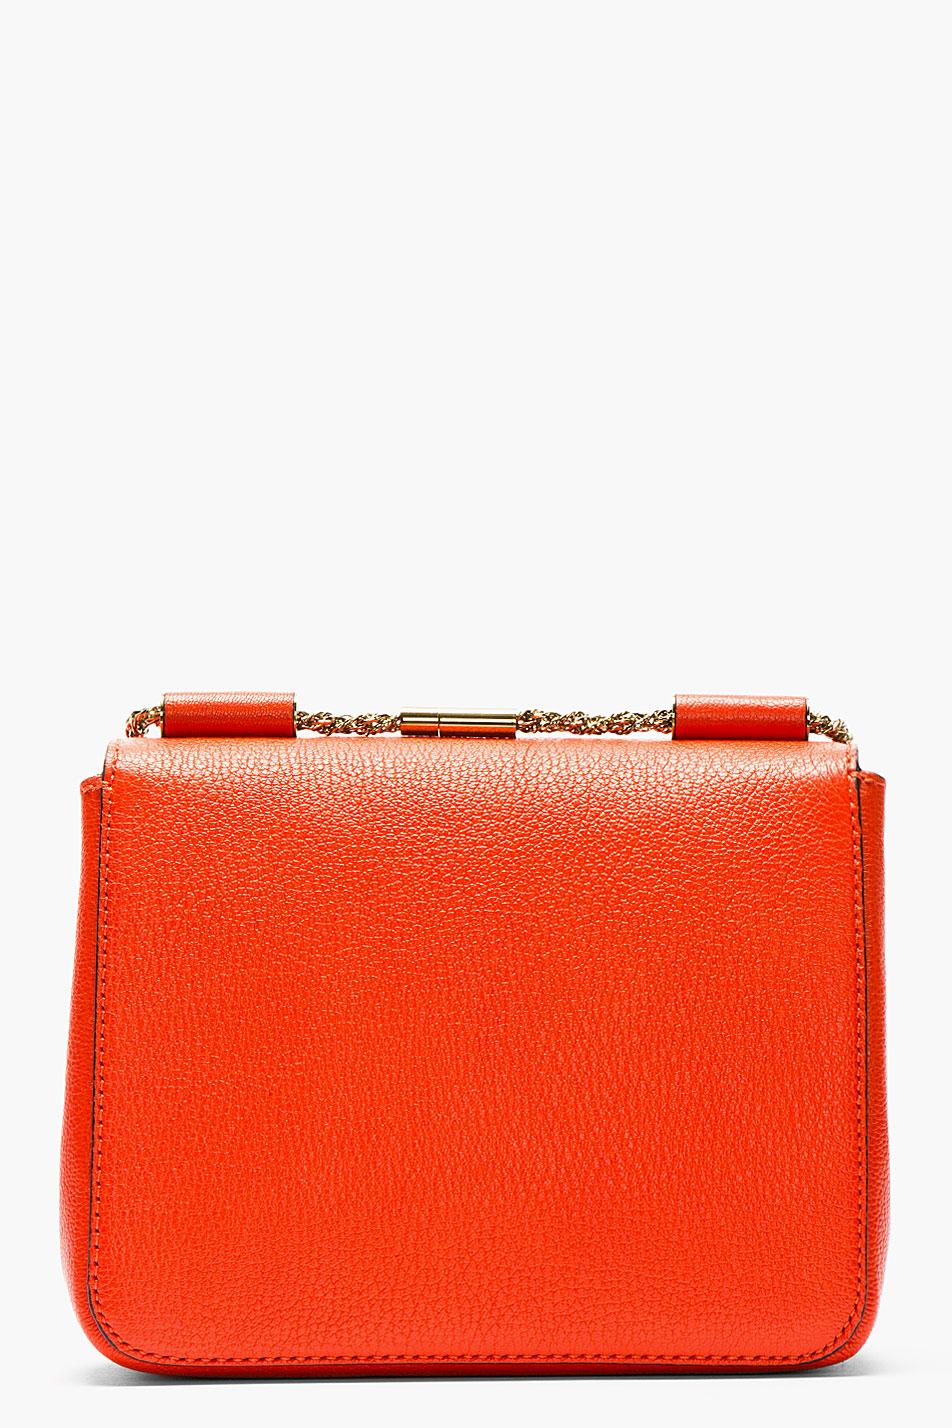 chloe cheap handbags - elsie small bag in grained leather